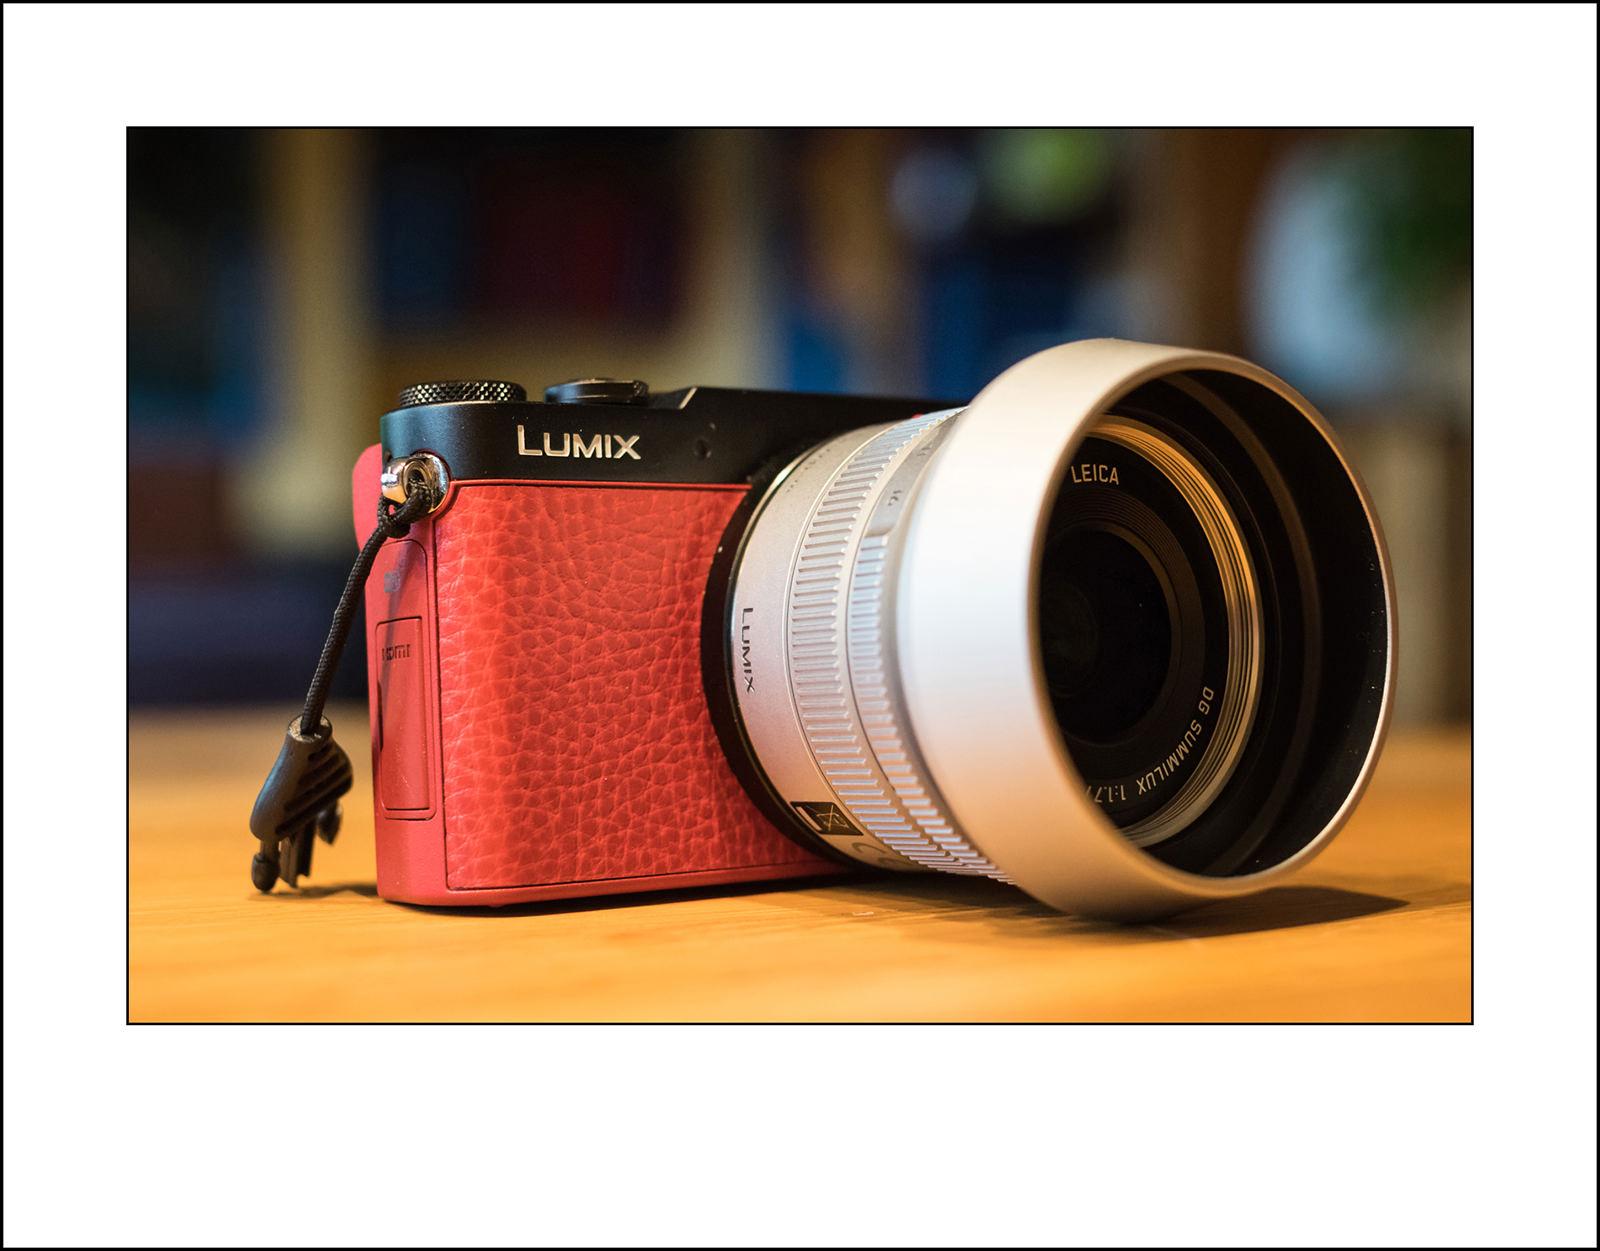 Panasonic GM5 - Panasonic Leica 15 f1.7